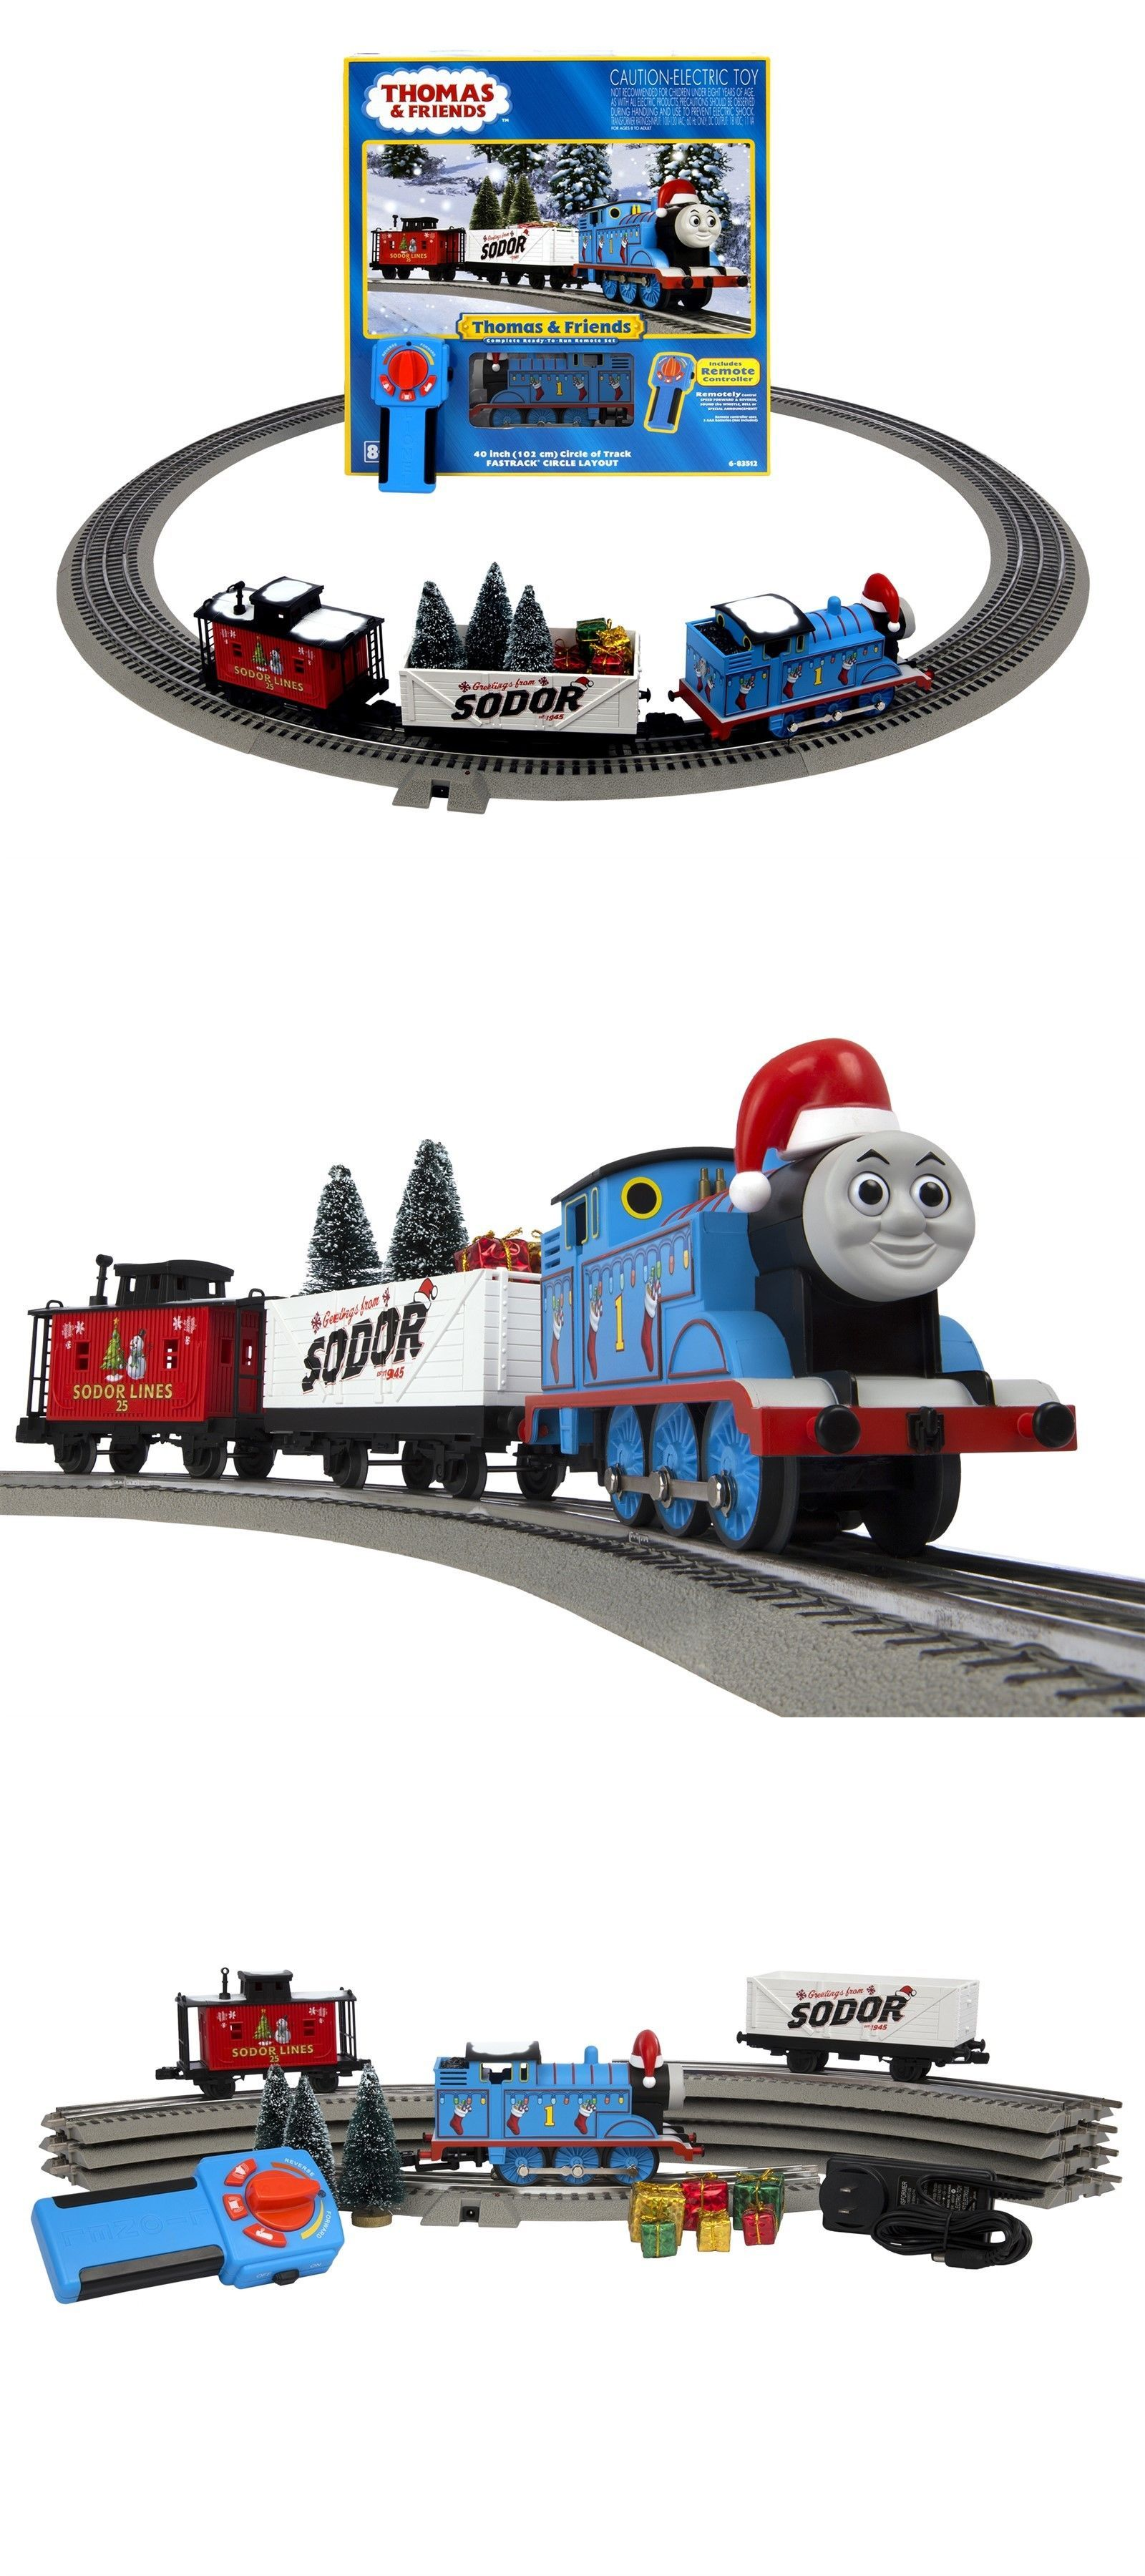 Thomas The Train Christmas Set.Lionel Thomas Friends Christmas Lionchief Remote Control